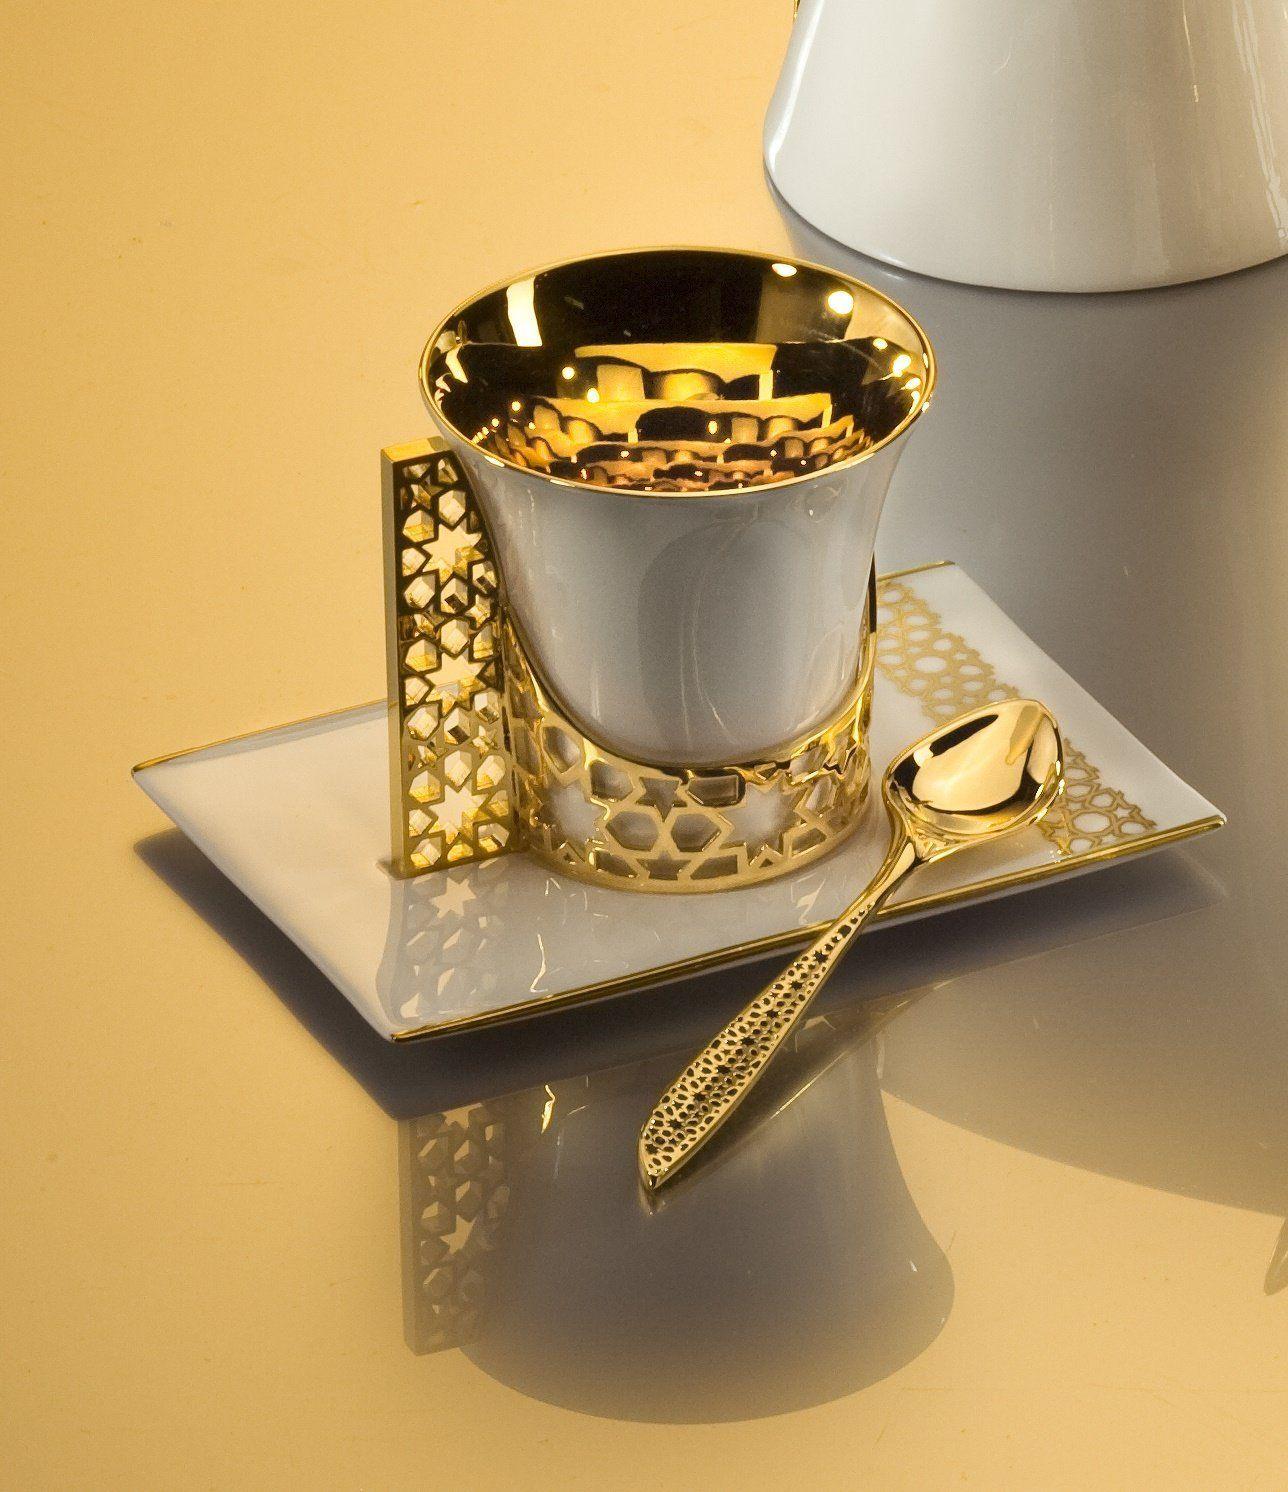 18K Gold Plated Arabesque Fine Bone China